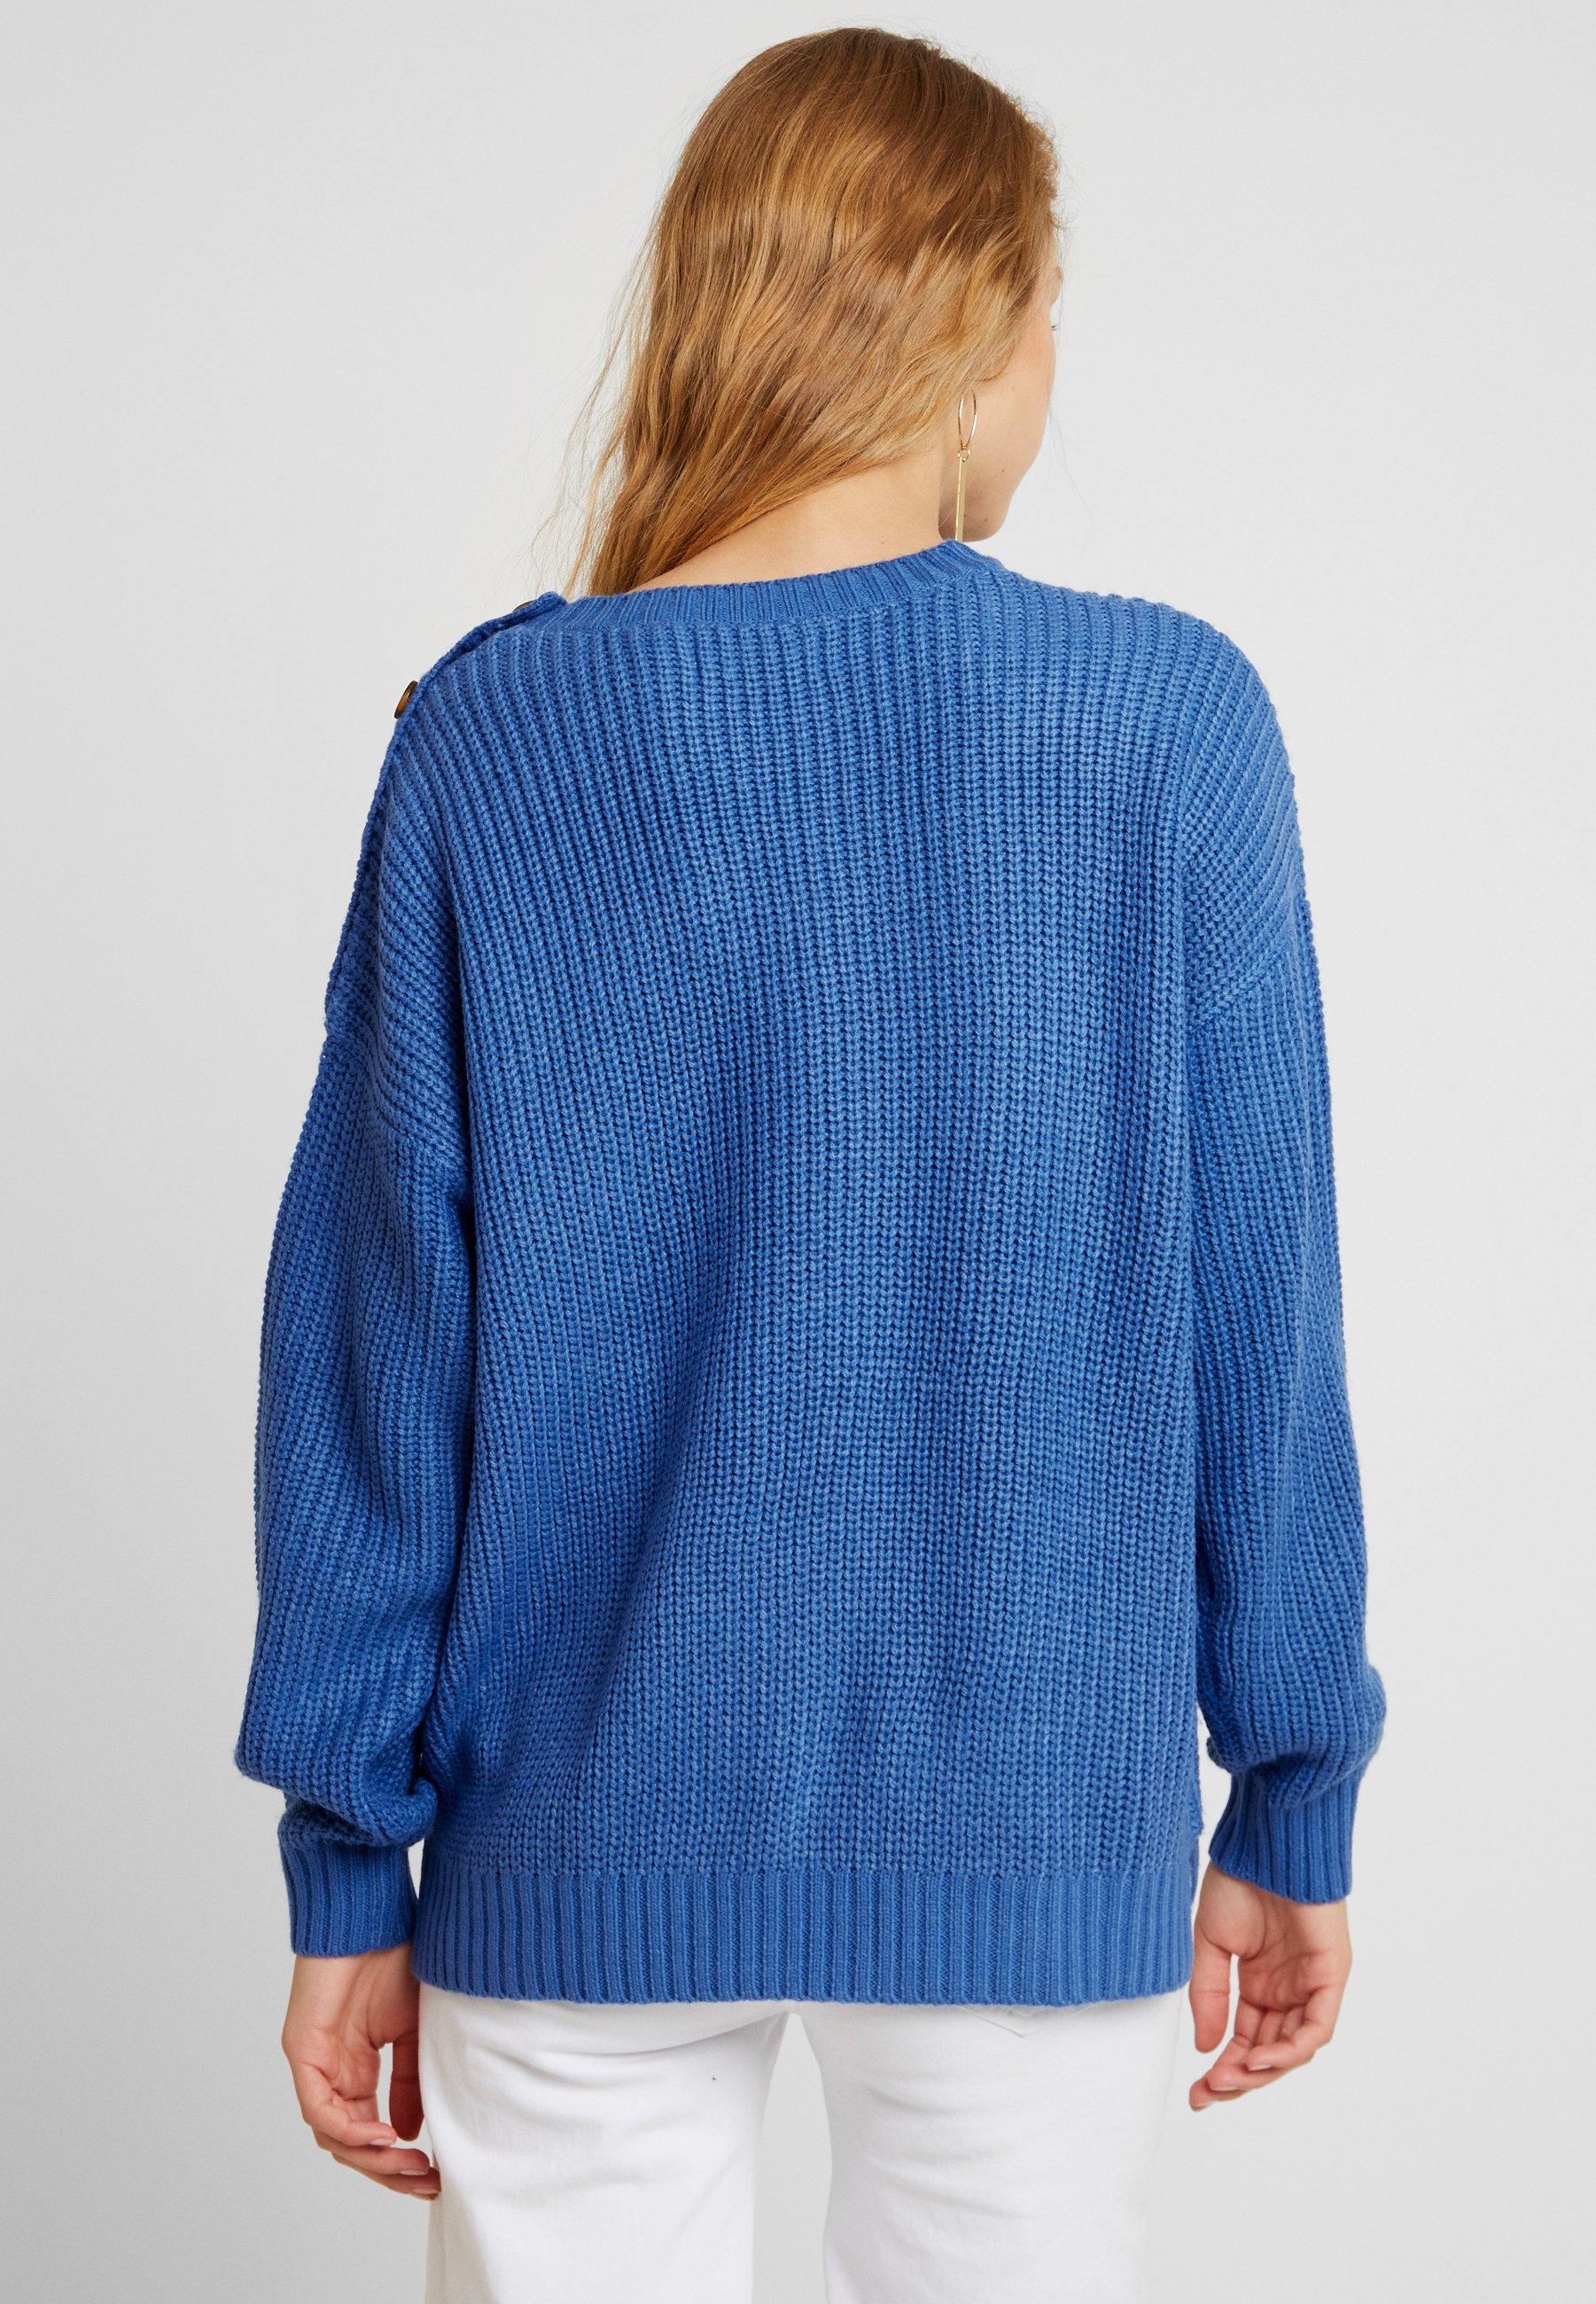 Blue Blue Blendshe ButtonPullover Strong Blendshe Blendshe Strong ButtonPullover ButtonPullover DH2eWEb9IY